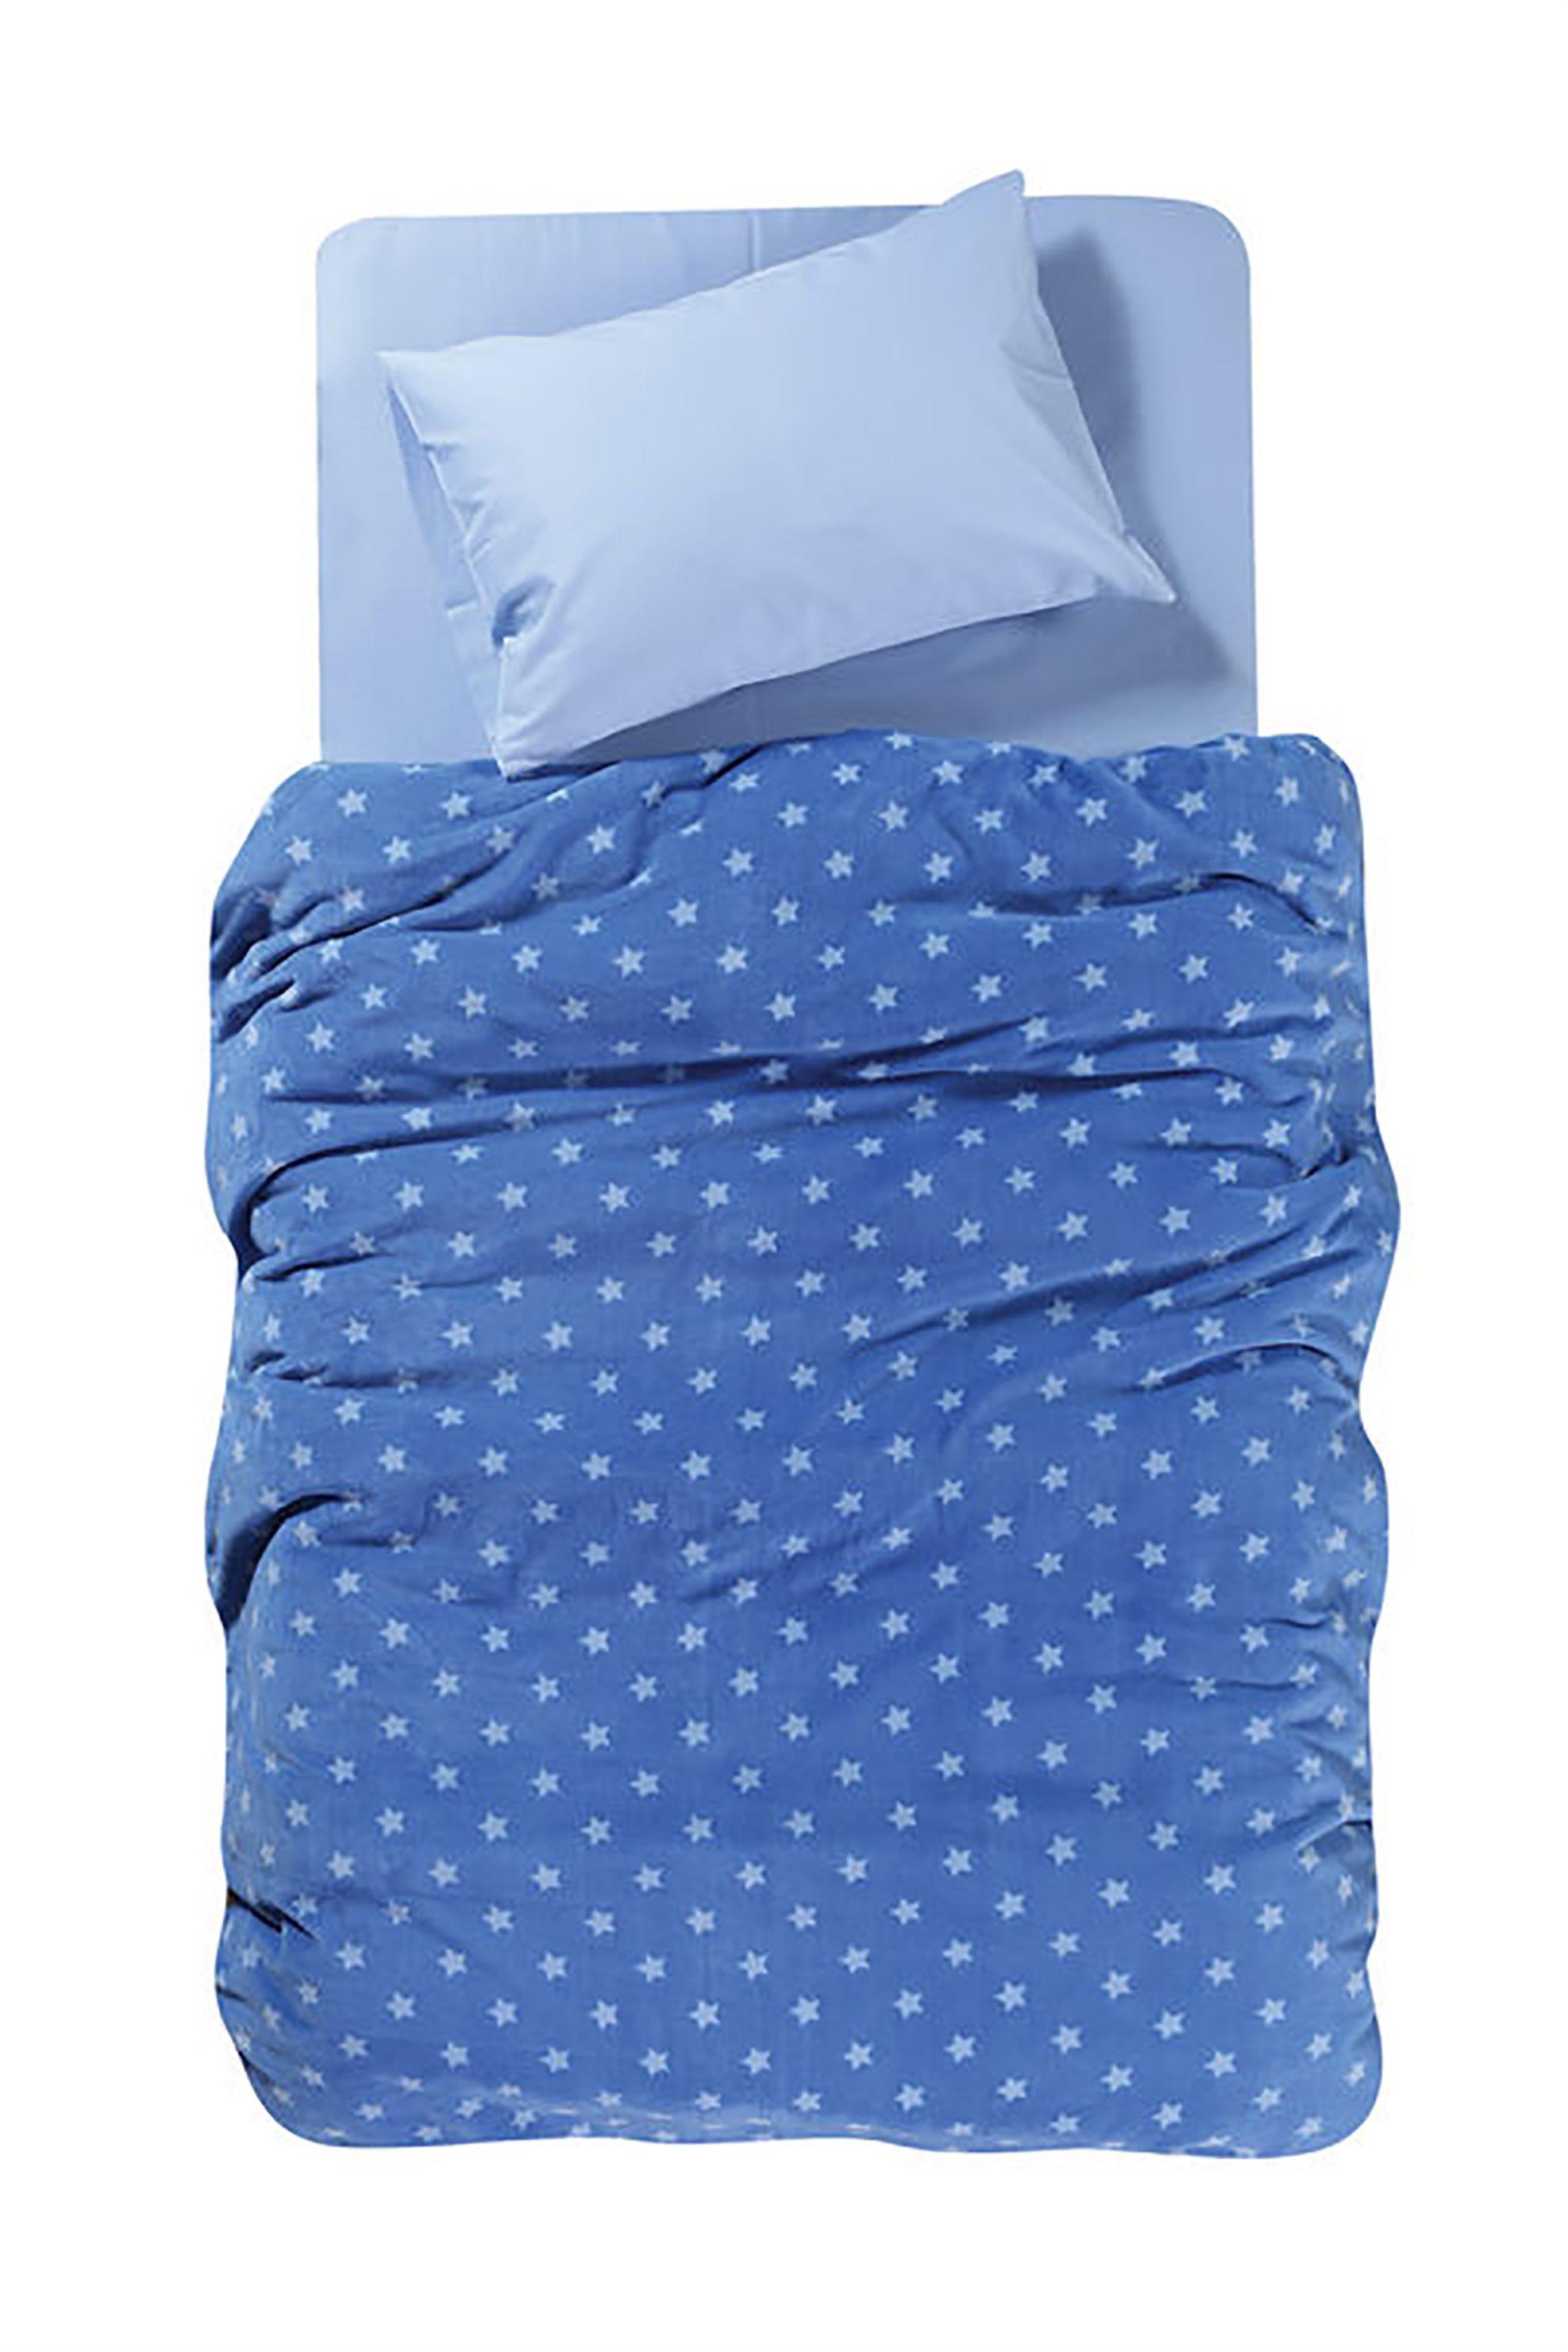 NEF-NEF Μονή κουβέρτα fleece Star Attack (160x220) - 019732 - Μπλε Ανοιχτό home   υπνοδωματιο   παιδια   κουβέρτες   κουβέρτες   κουβέρτα μονή